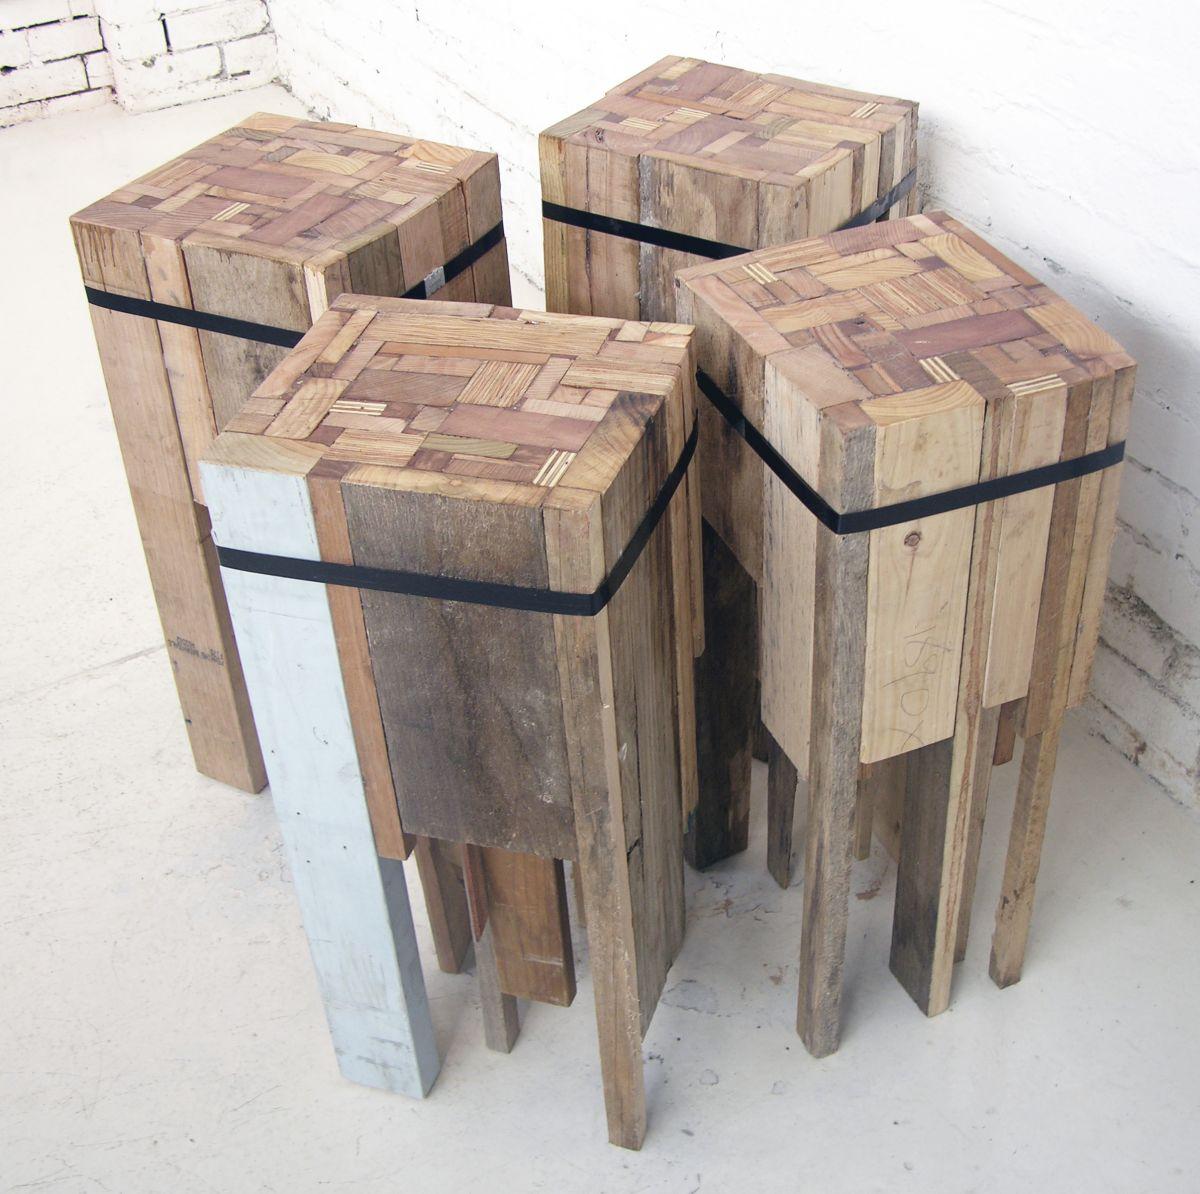 Recycled Furniture Viskas Apie Interjer